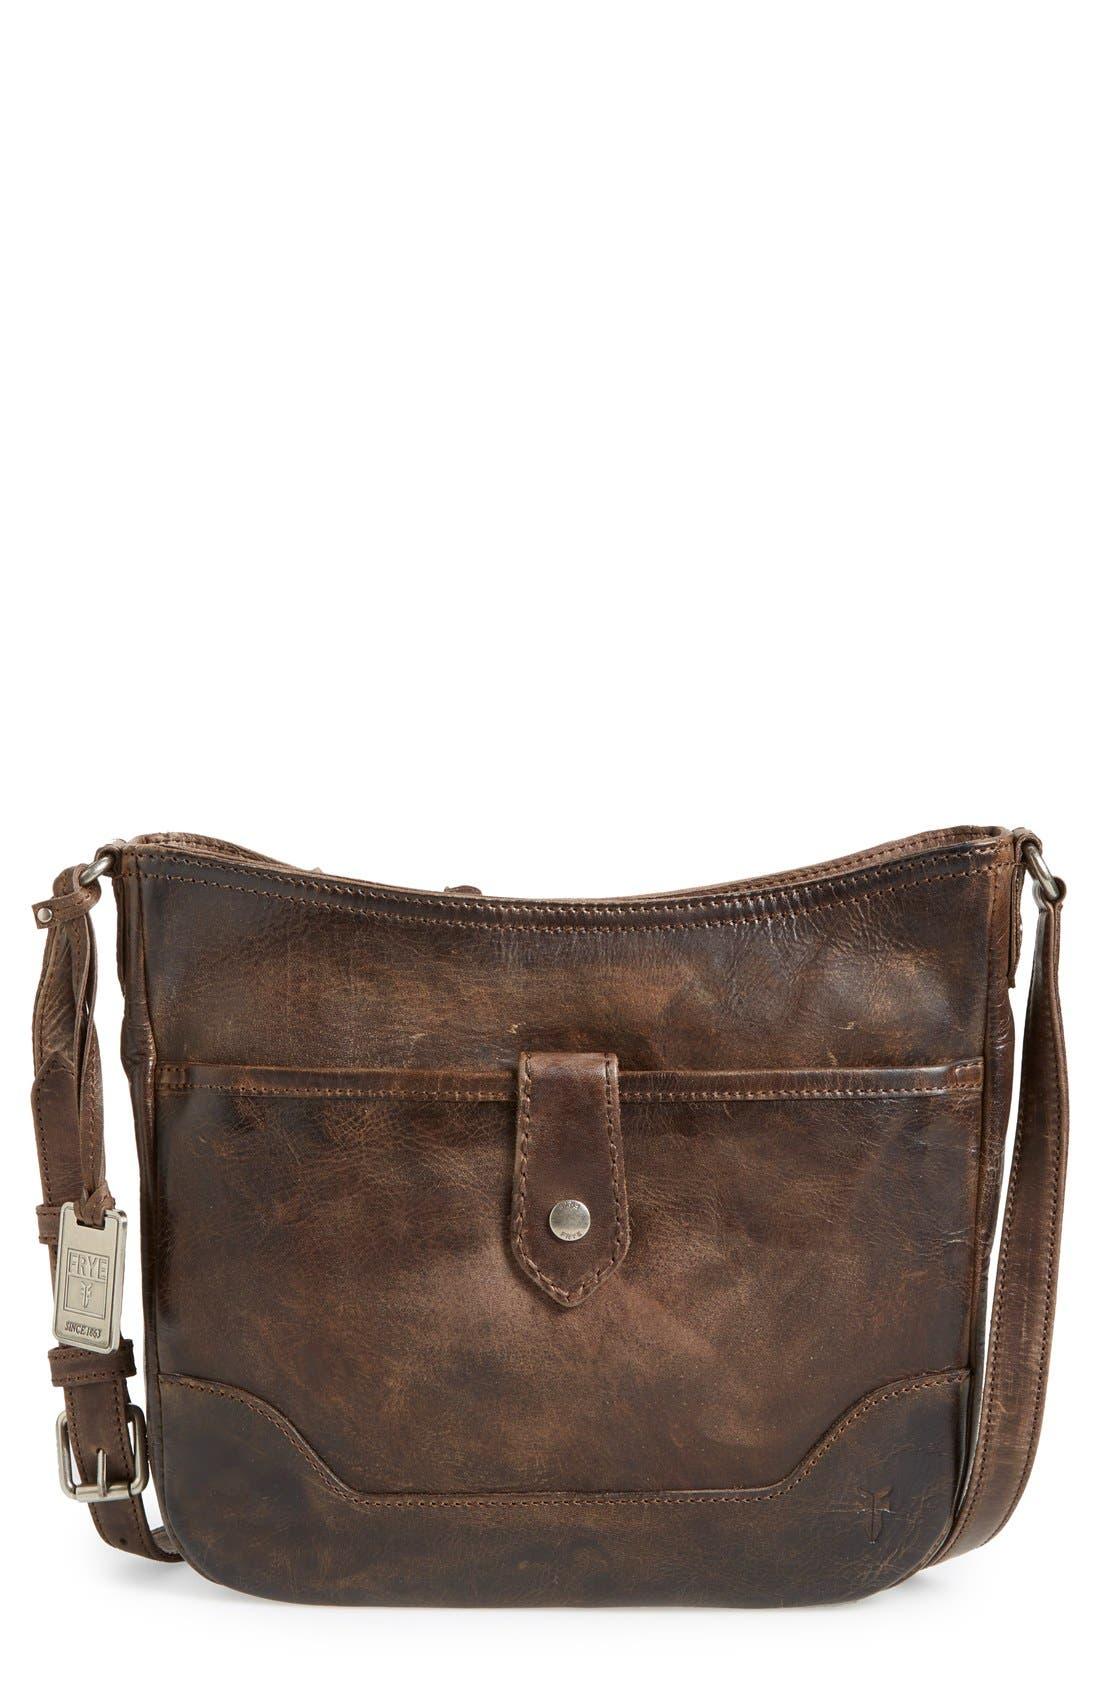 Alternate Image 1 Selected - Frye Melissa Button Crossbody Bag